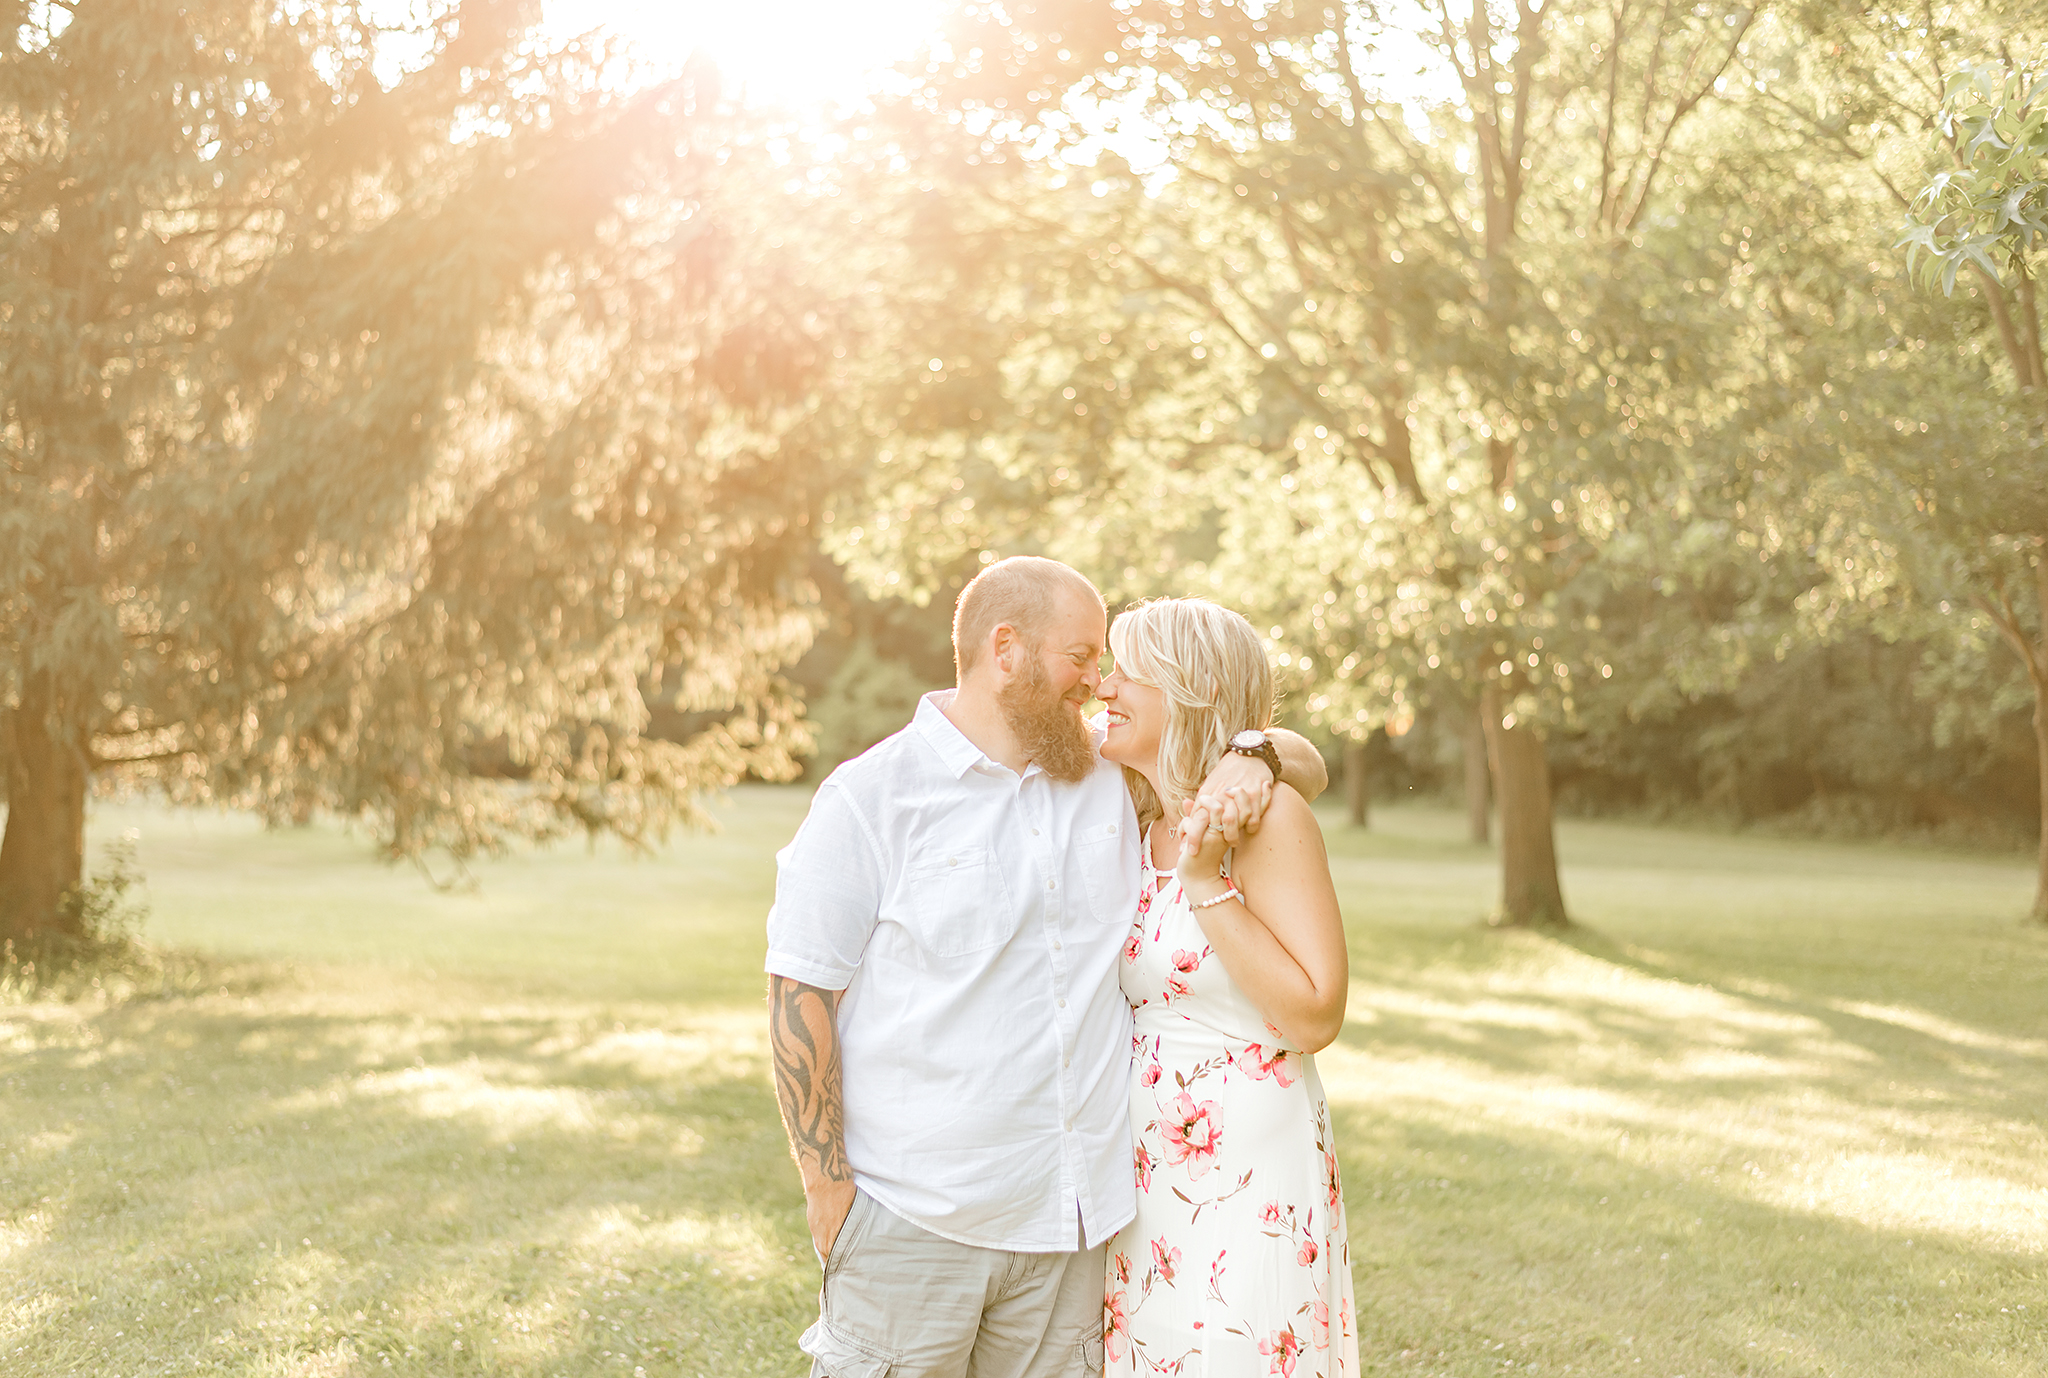 Lindsay-Adkins-Photography-Michigan-Engagement-And-Wedding-Photographer14